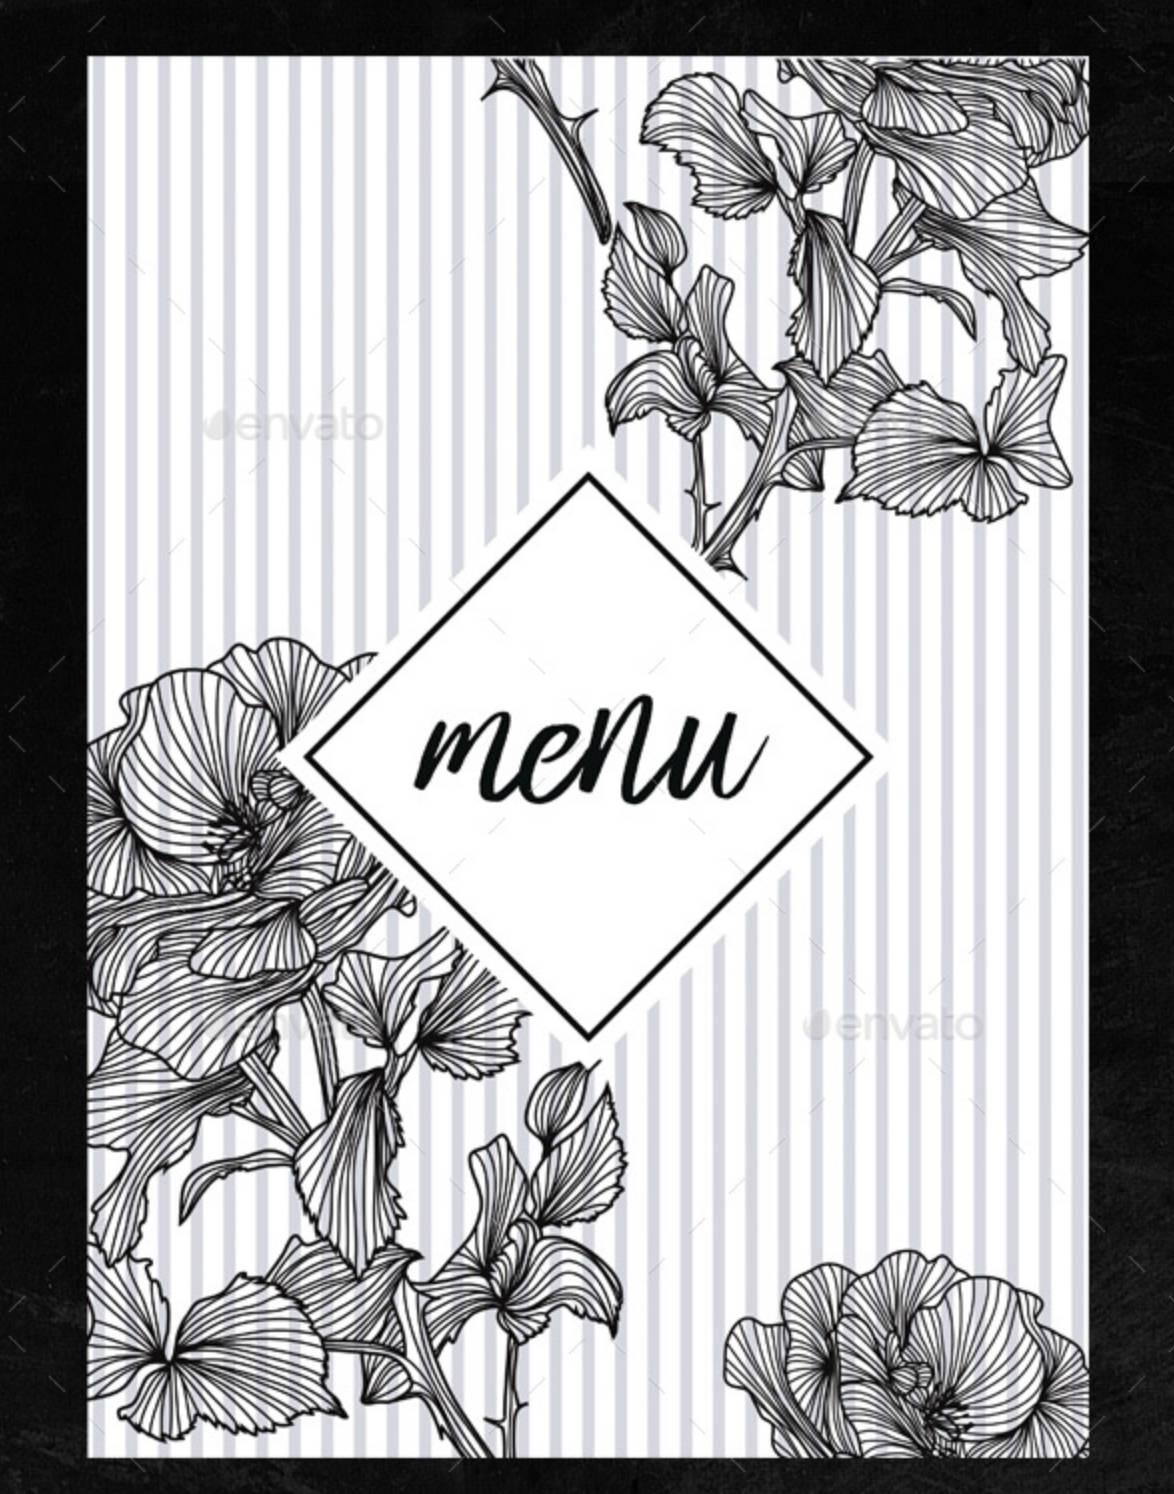 Menù floreale per ristorante pub-2